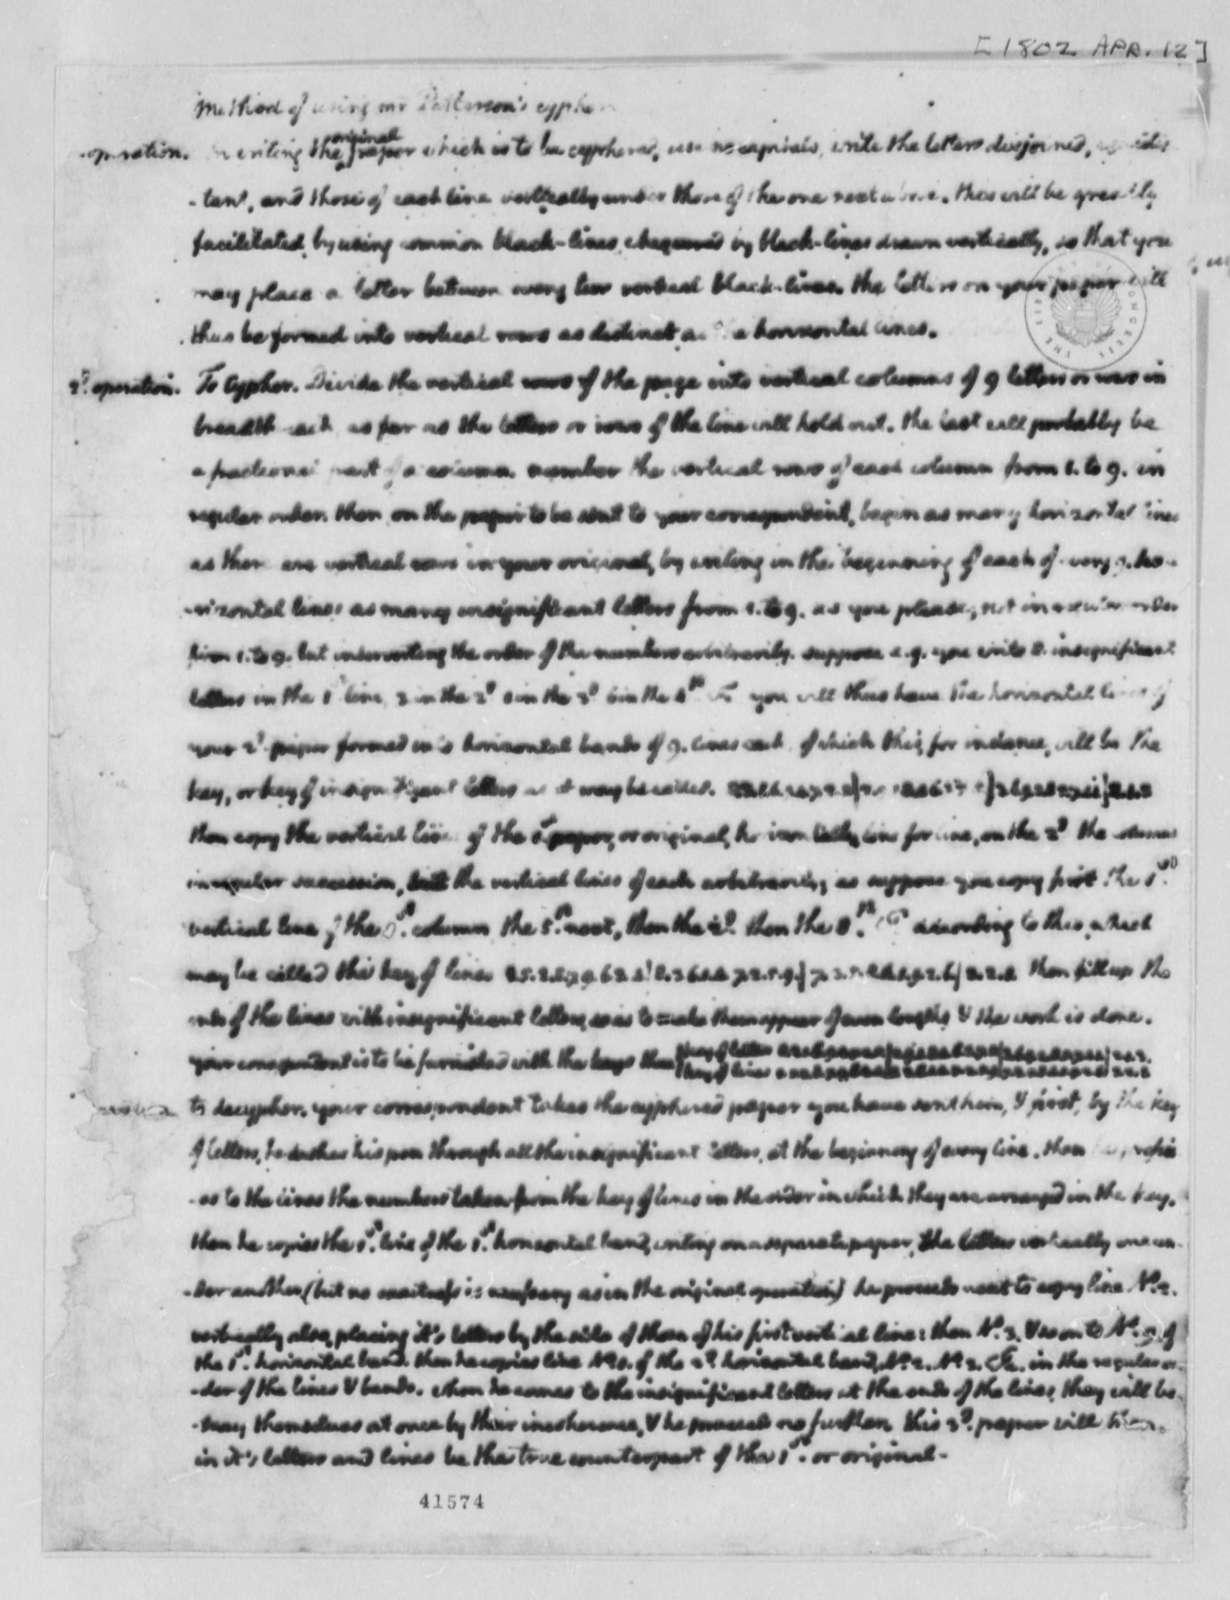 Thomas Jefferson, April 12, 1802, Patterson's Cipher